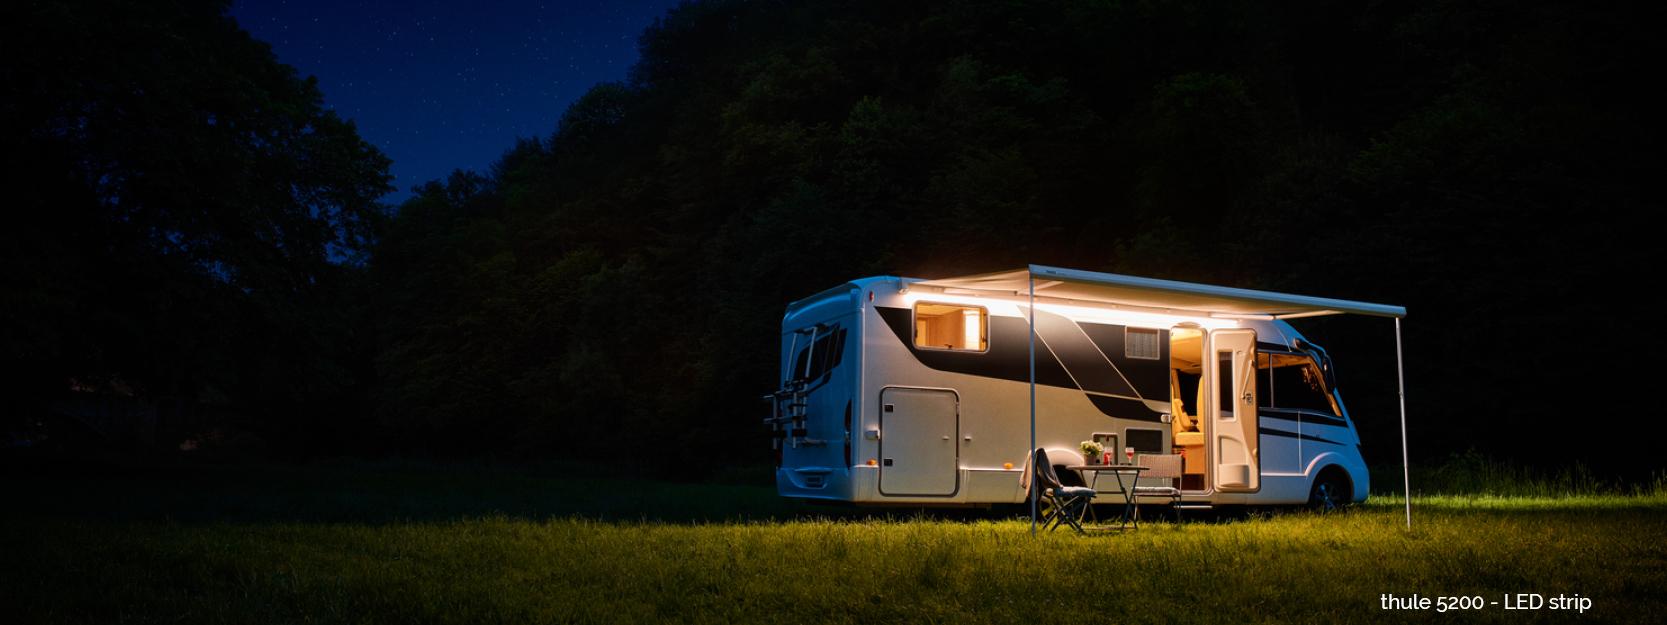 Vanomobil thule 5200 LED strip